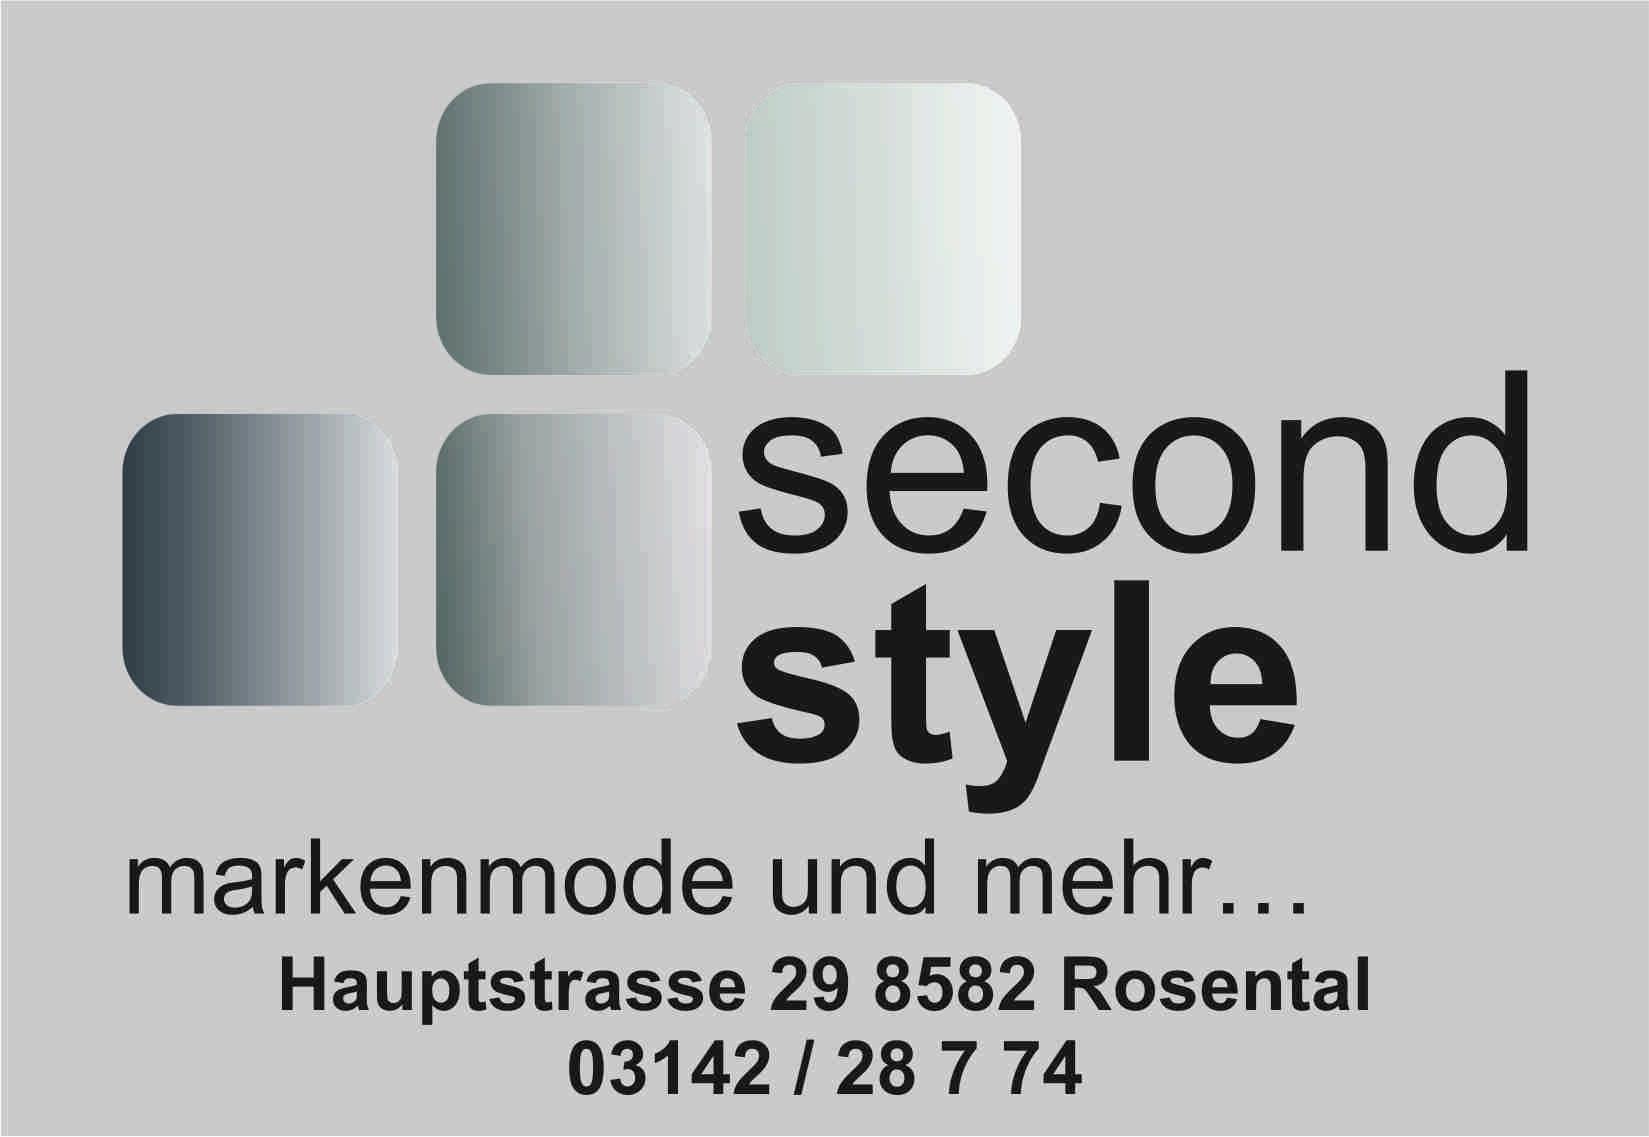 2nd_Style_logo